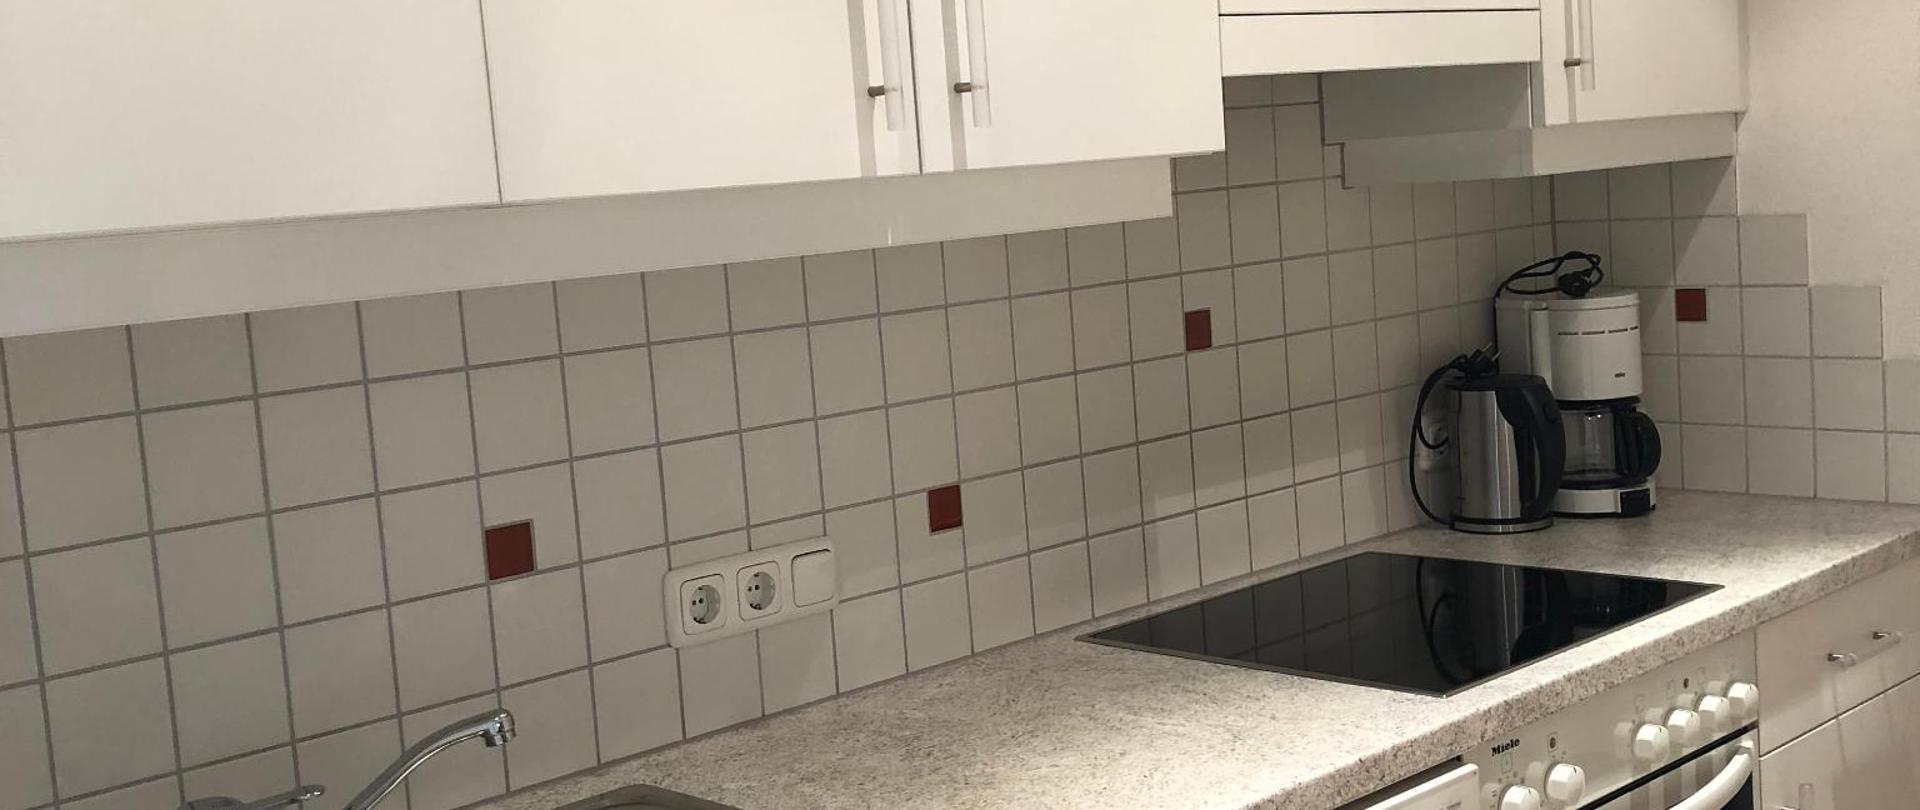 Küchenblock_Apartment_Tyrol_Deluxe.jpg